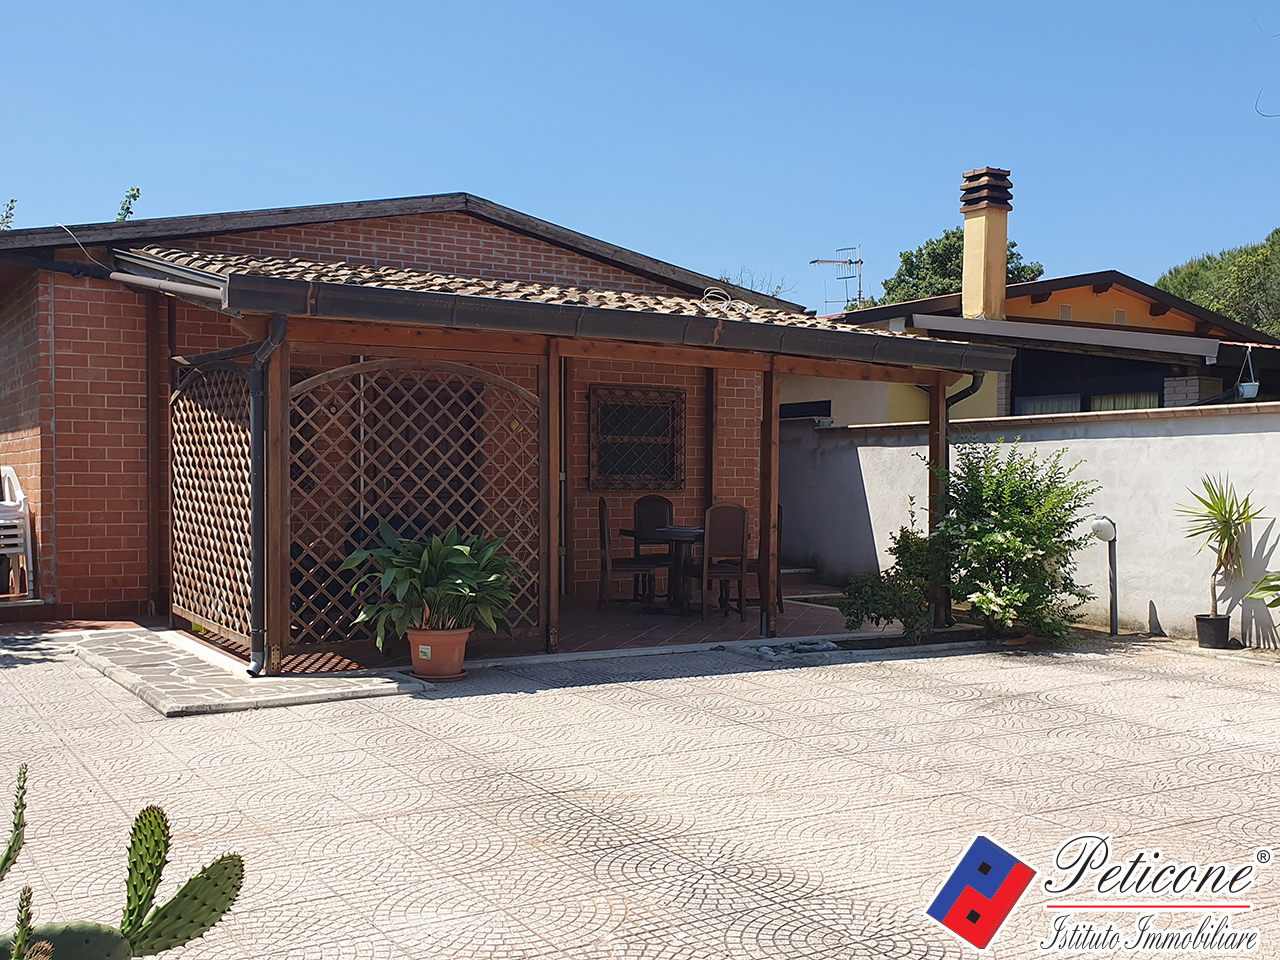 Villa in Vendita a Fondi: 4 locali, 50 mq - Foto 1